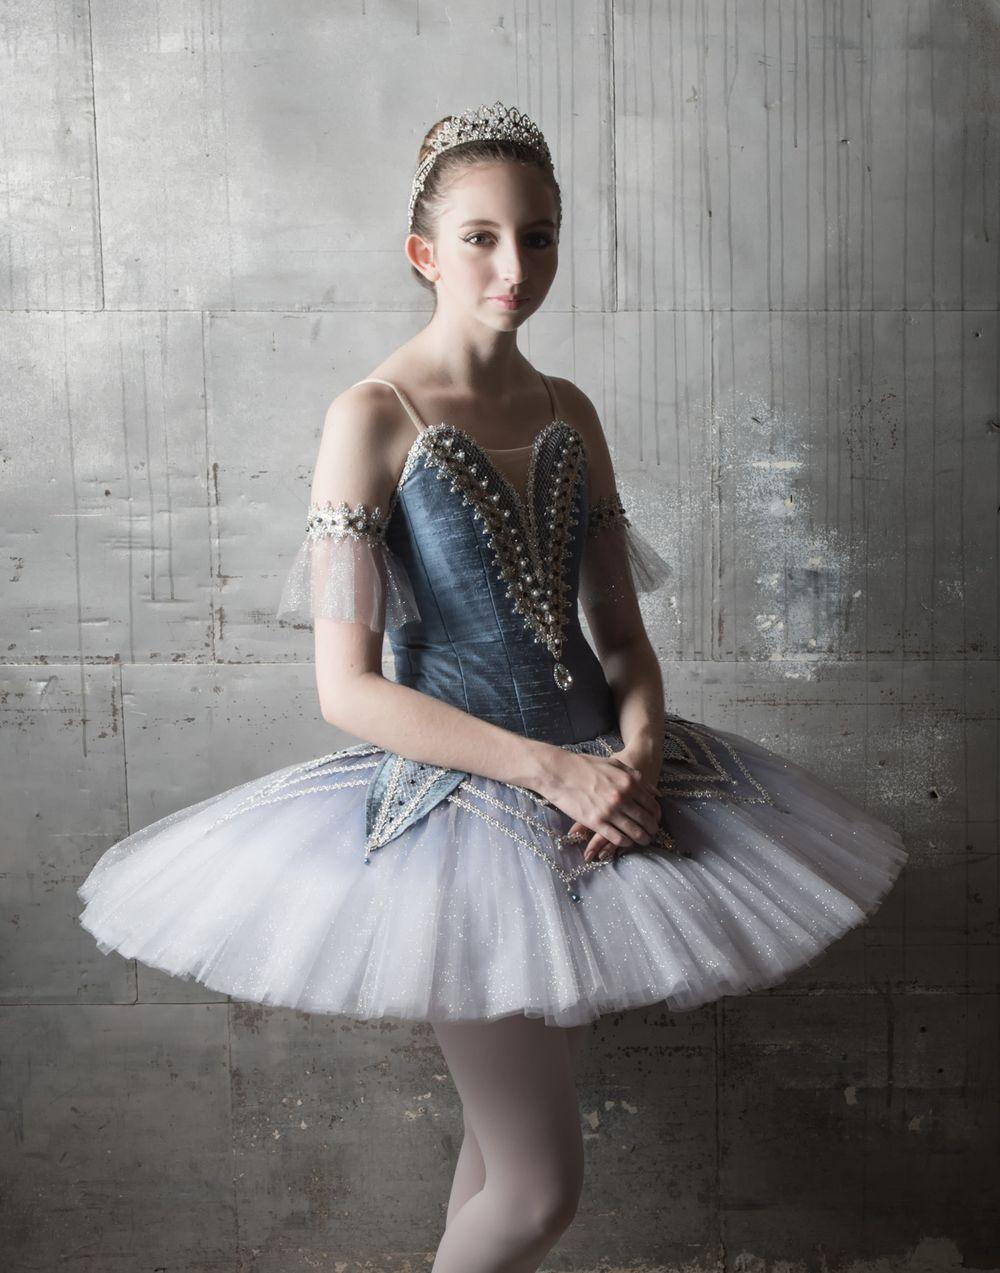 Gretchen Lerna photographed  by Cassandra Plavoukos